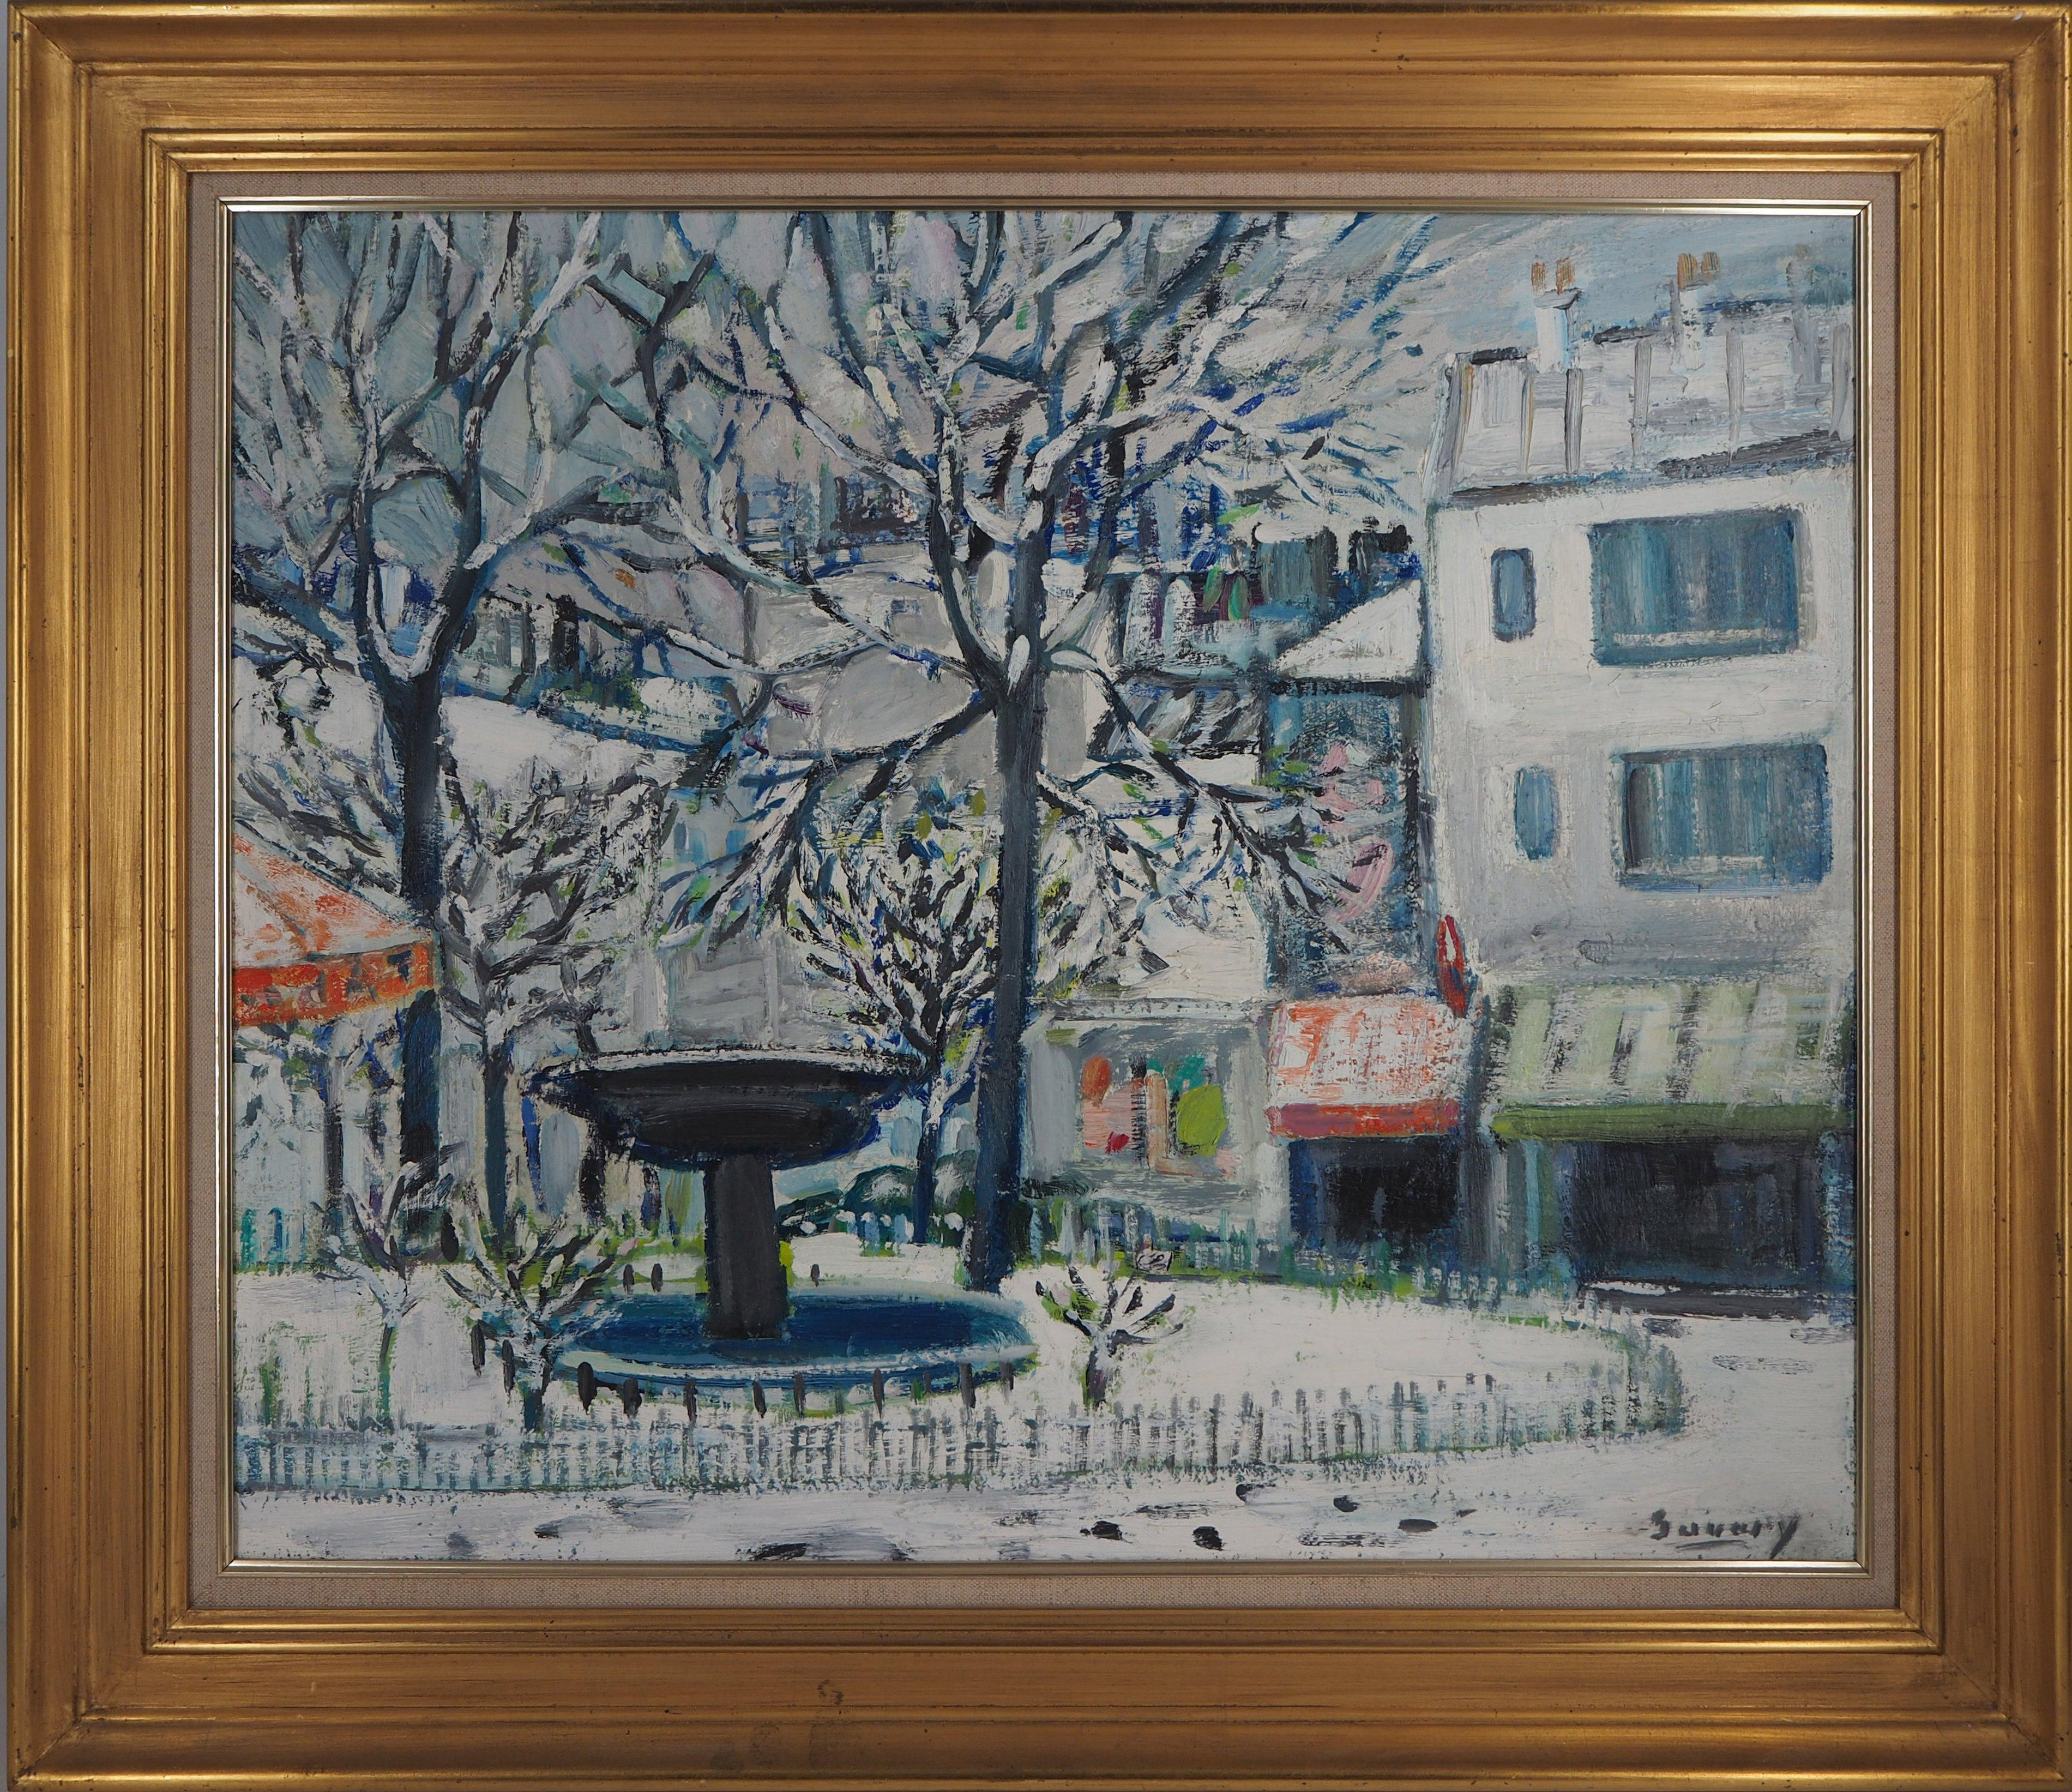 Paris : Pigalle Square - Original oil on canvas, signed